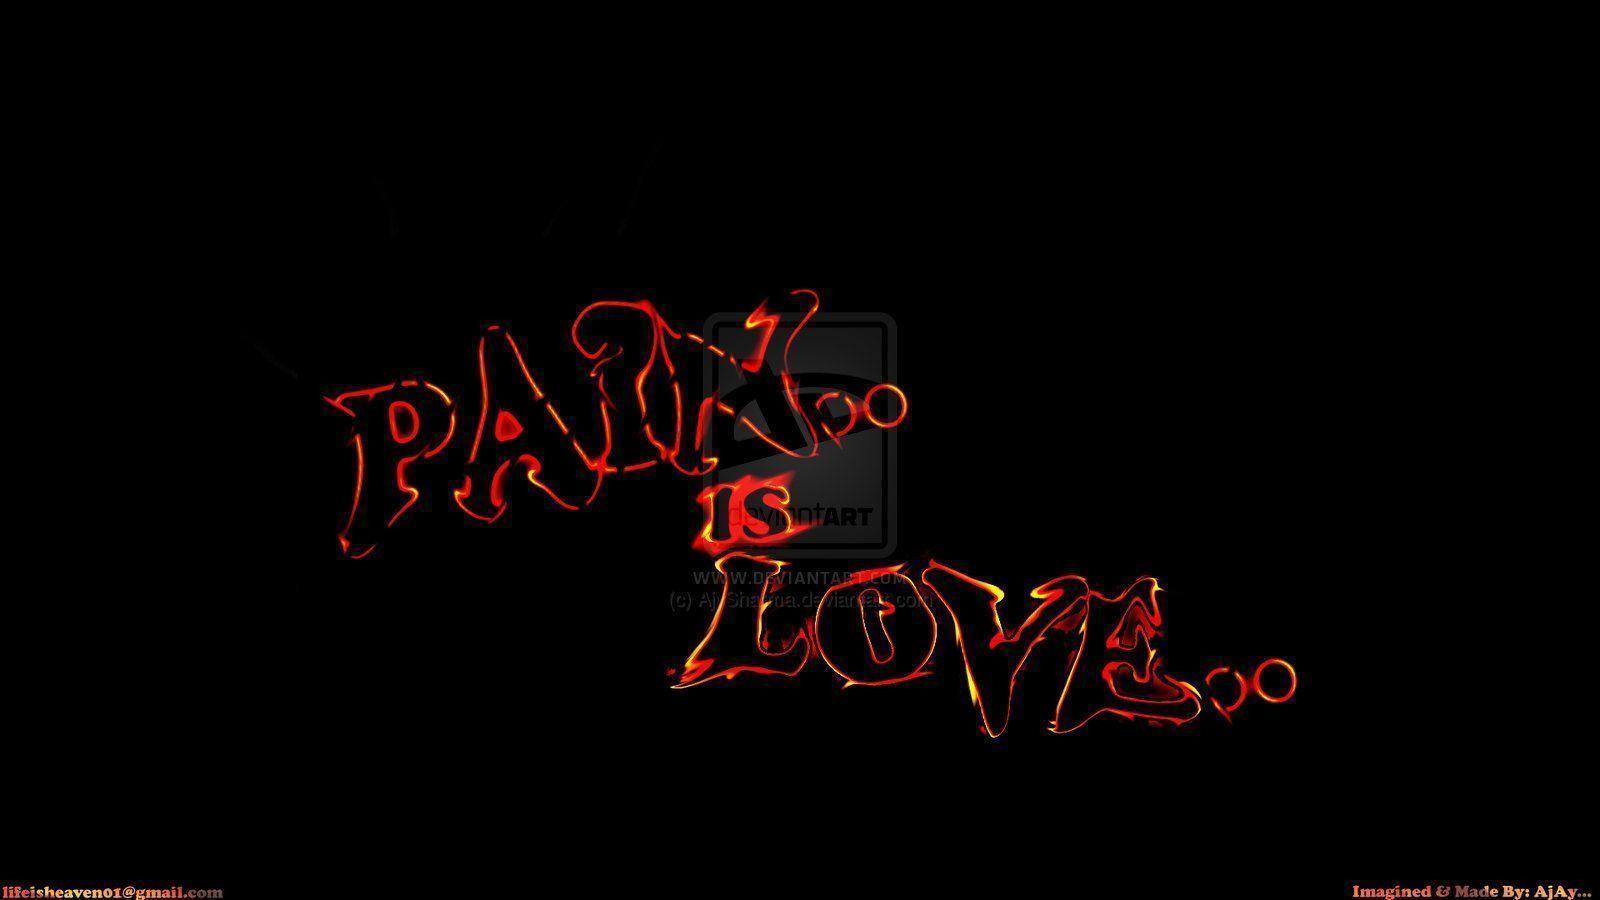 Painful Love Wallpaper Desktop : Love Pain Wallpapers - Wallpaper cave